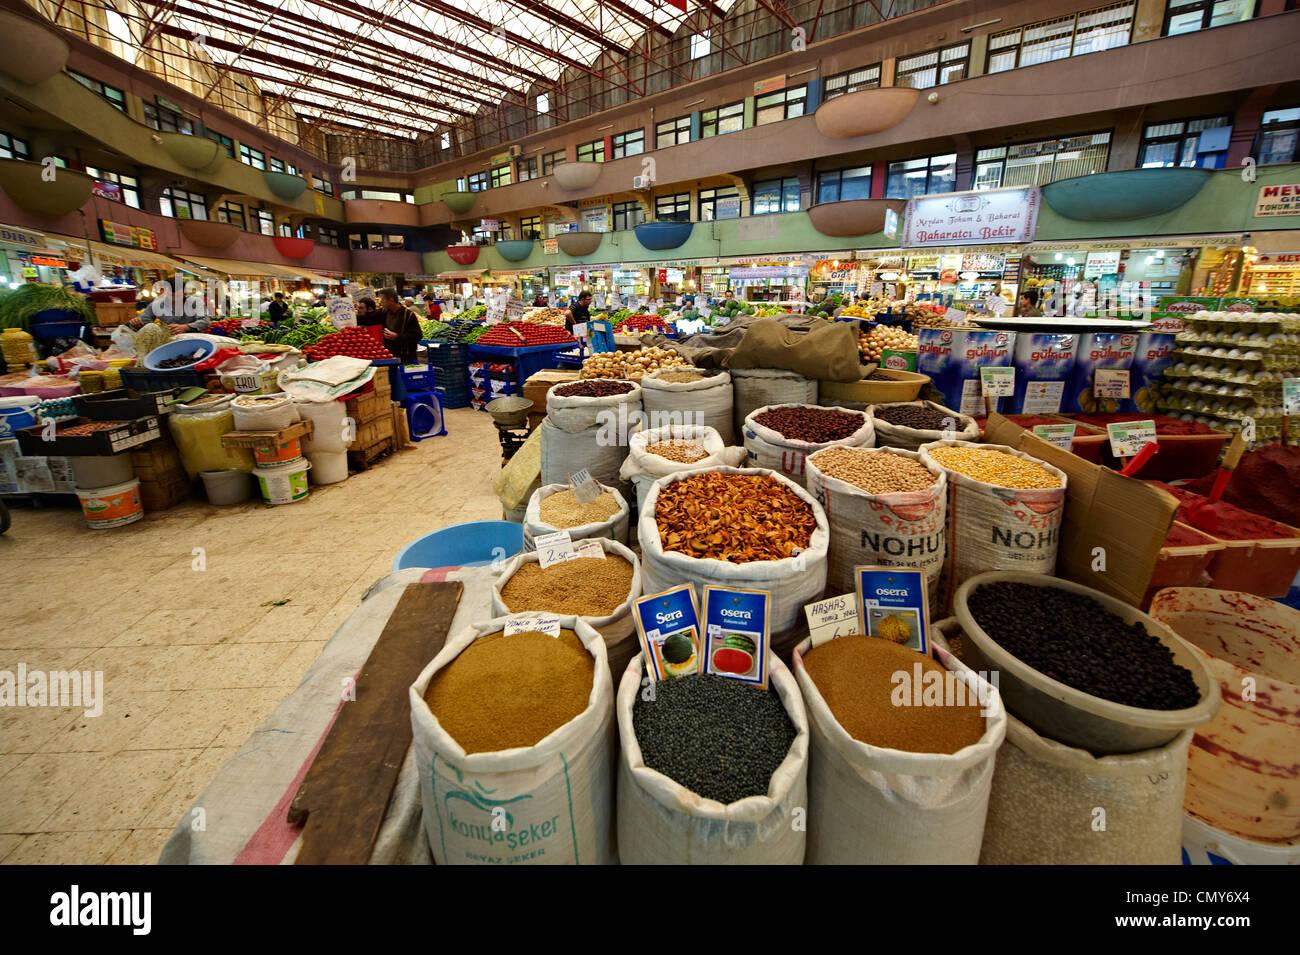 Spice shops of the food Bazaar of Konya, Turkey - Stock Image